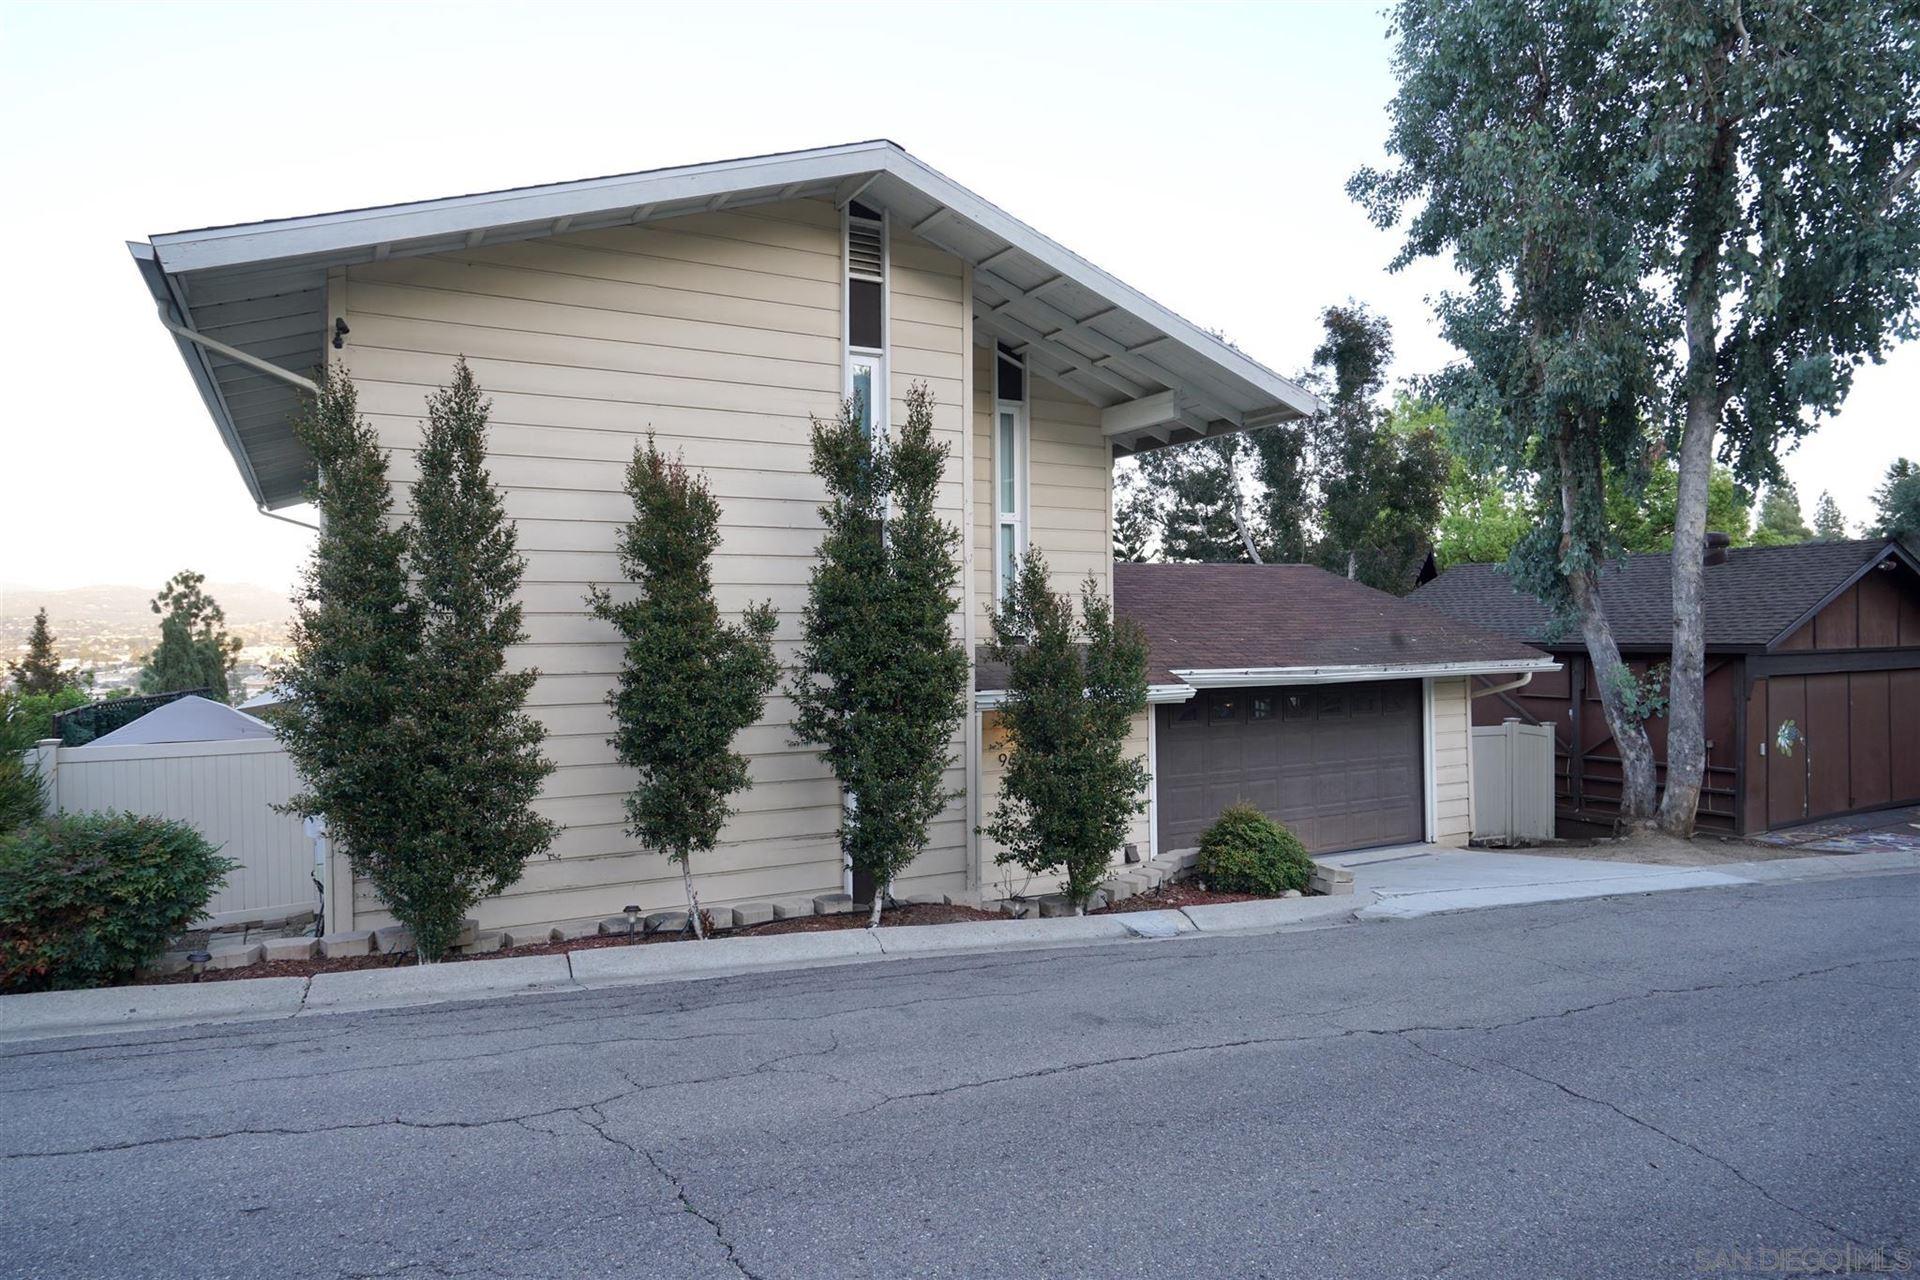 Photo of 966 Eastside Road, El Cajon, CA 92020 (MLS # 210009068)